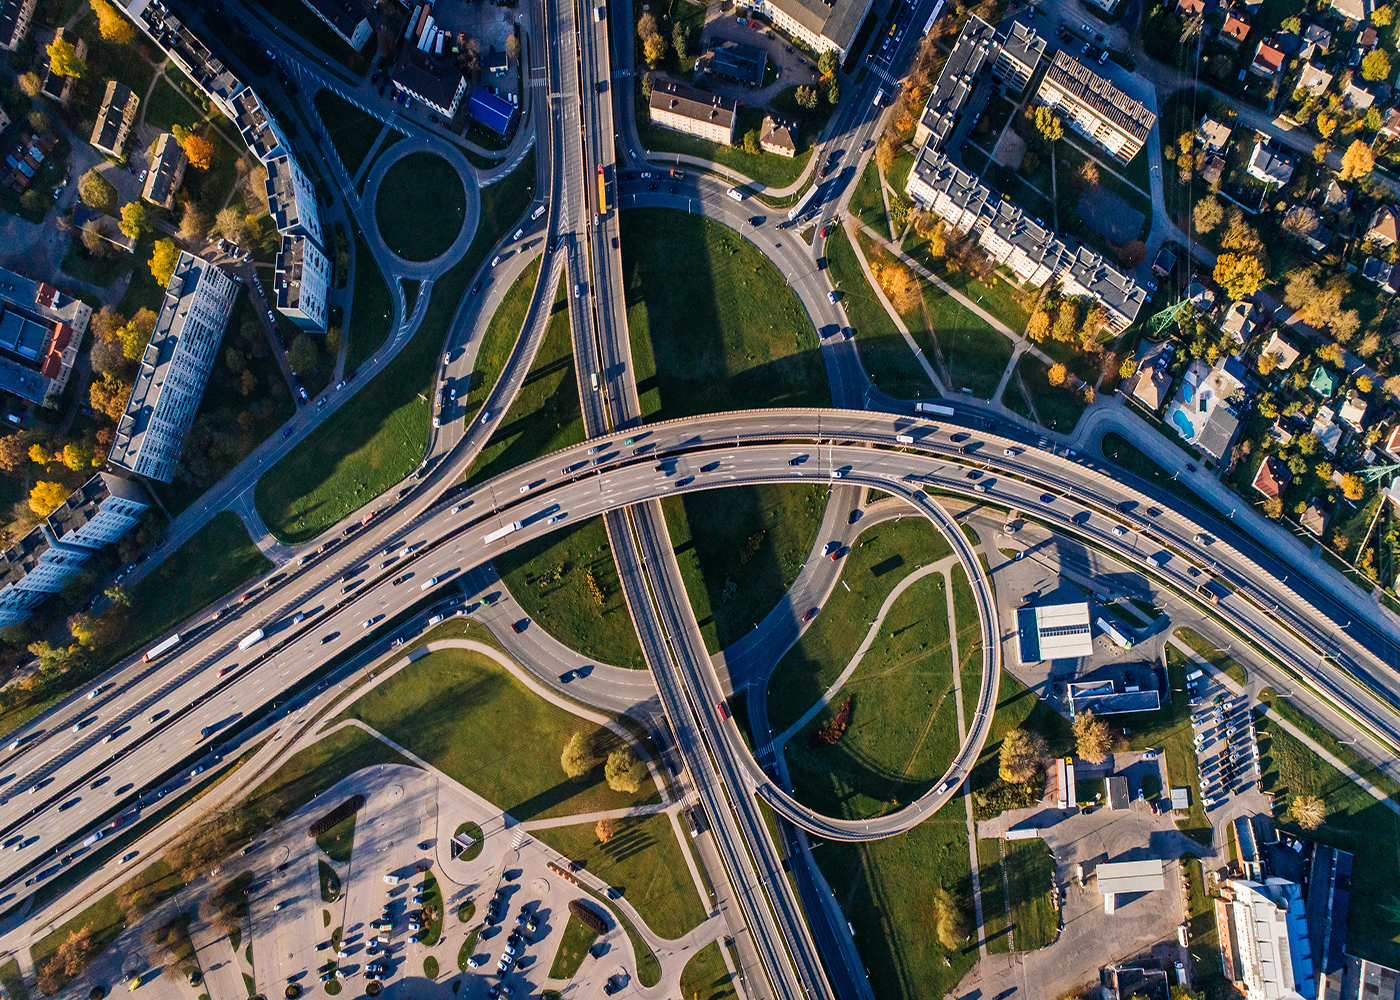 401(k) Plan Sponsors: The Importance of Benchmarking Your Plan Thumbnail